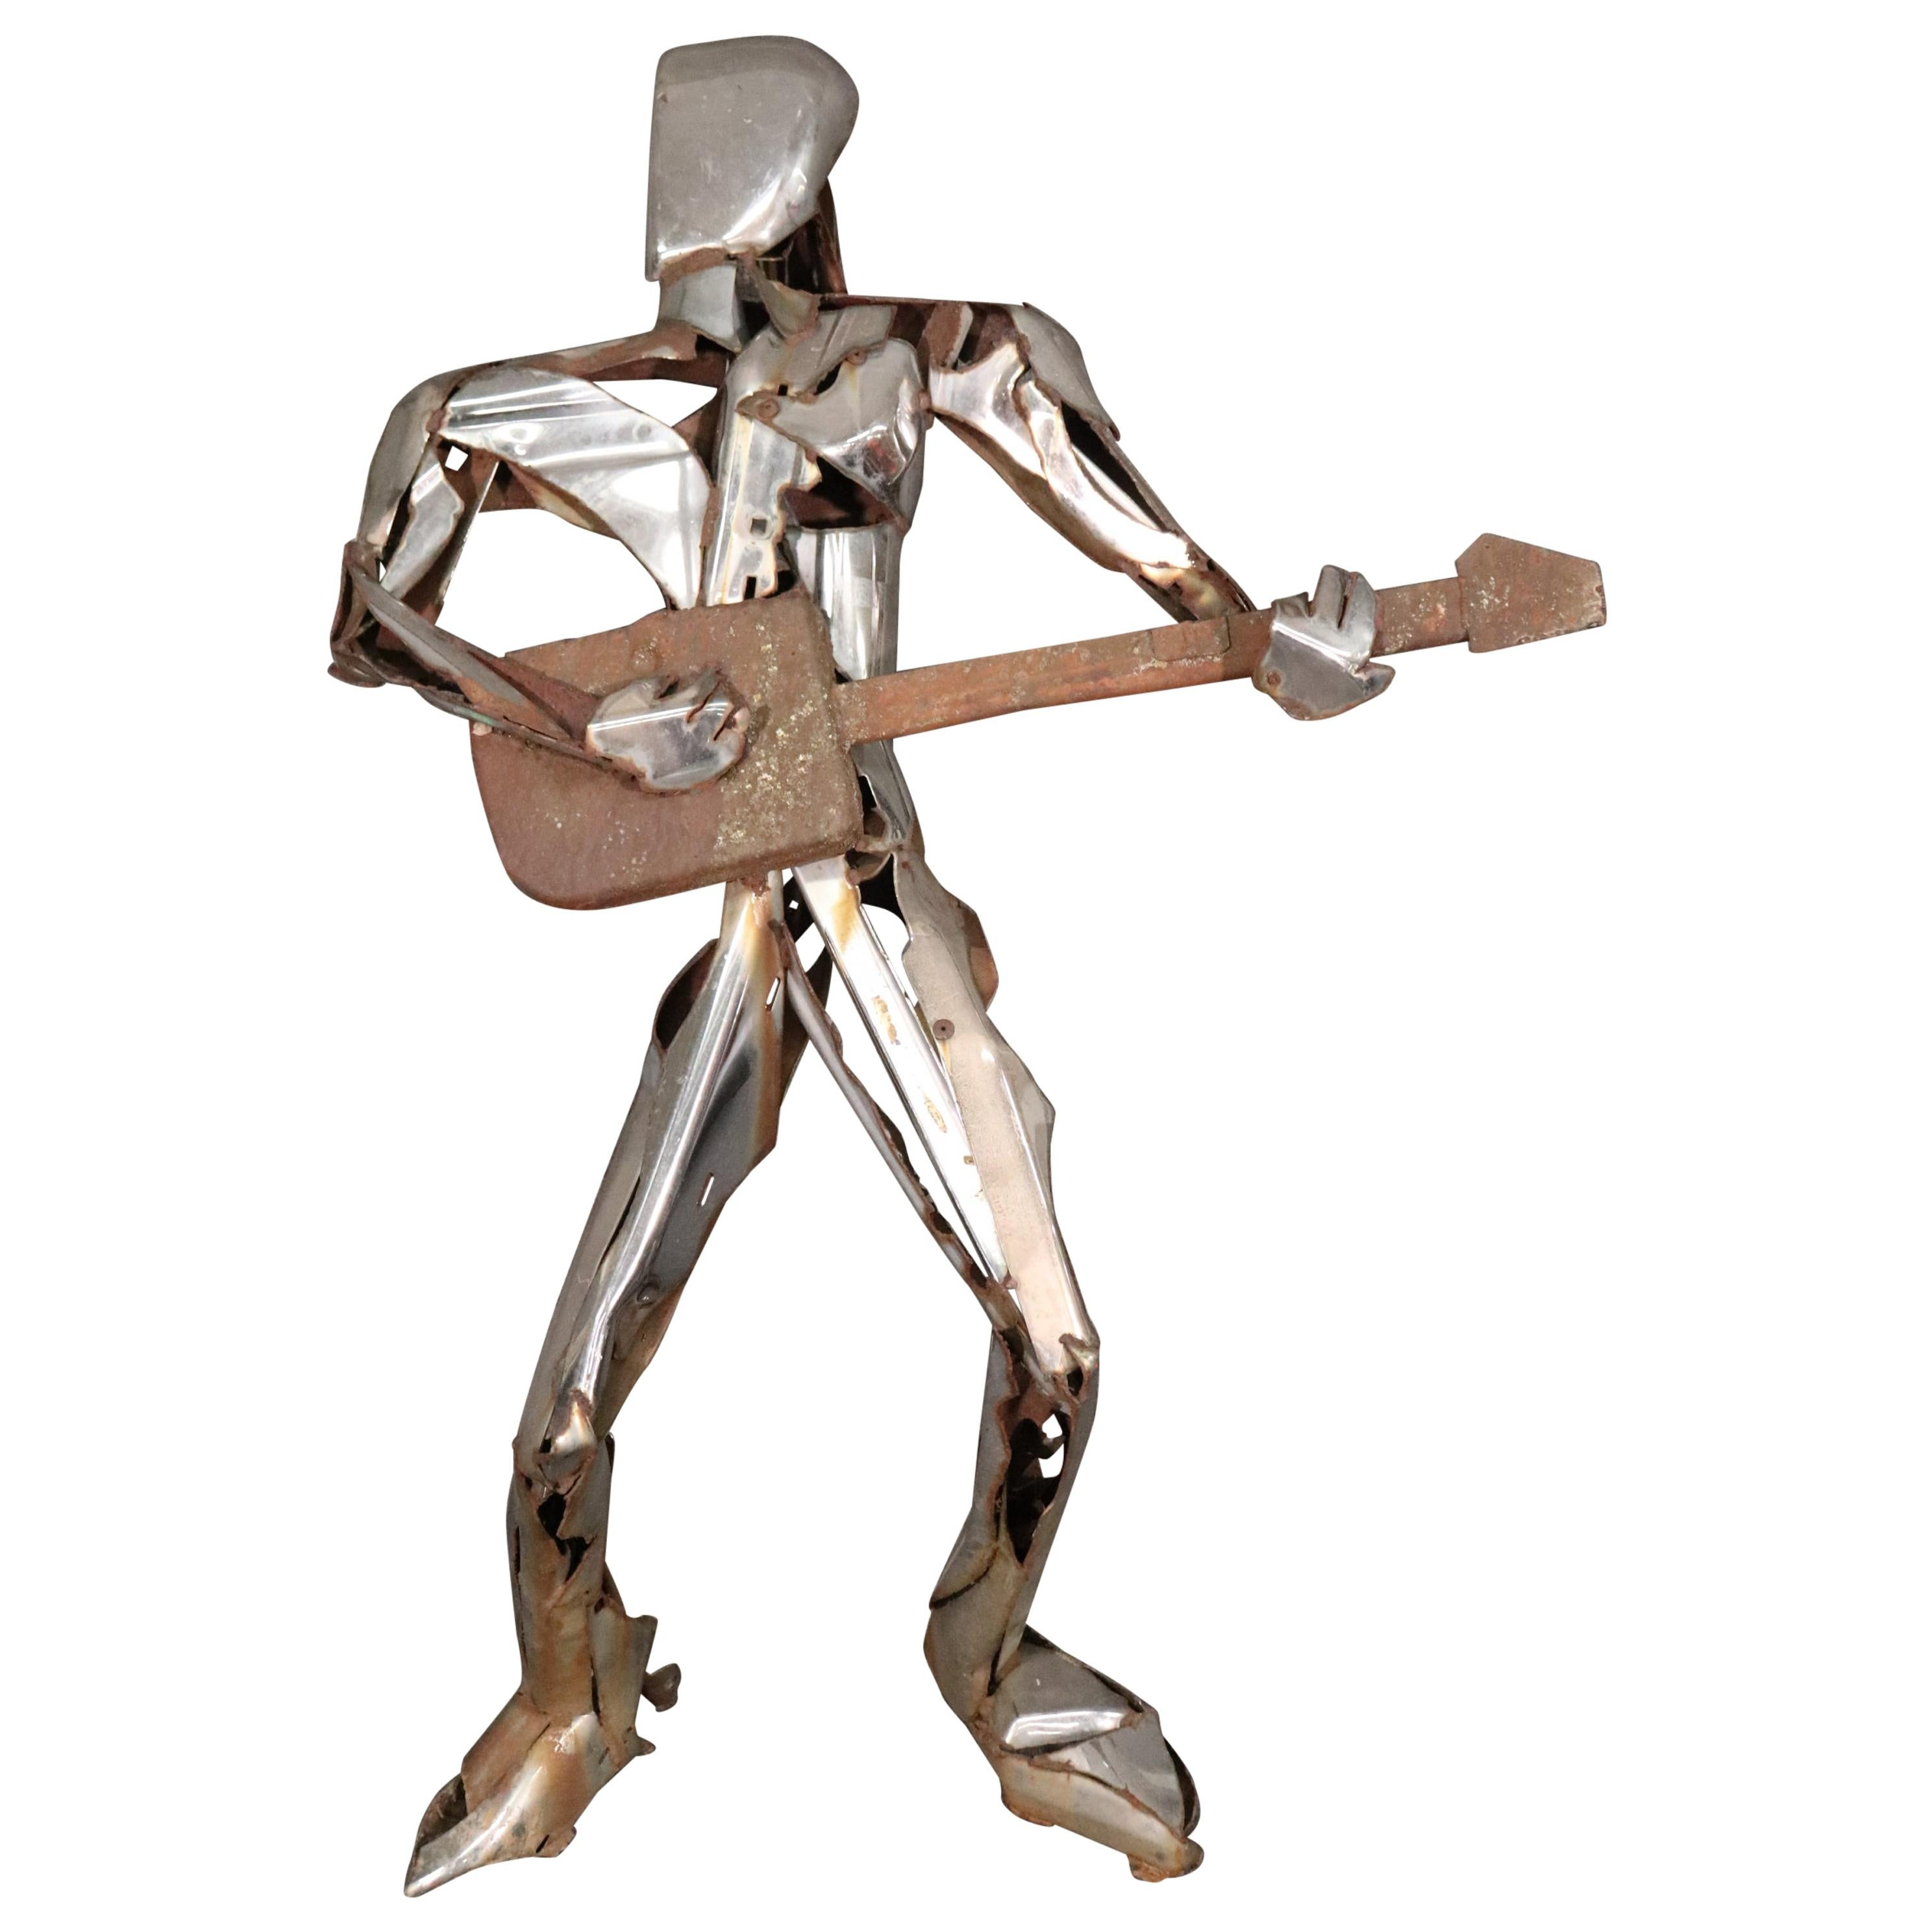 Steel Life Size Sculpture of Rock Star Guitar Player